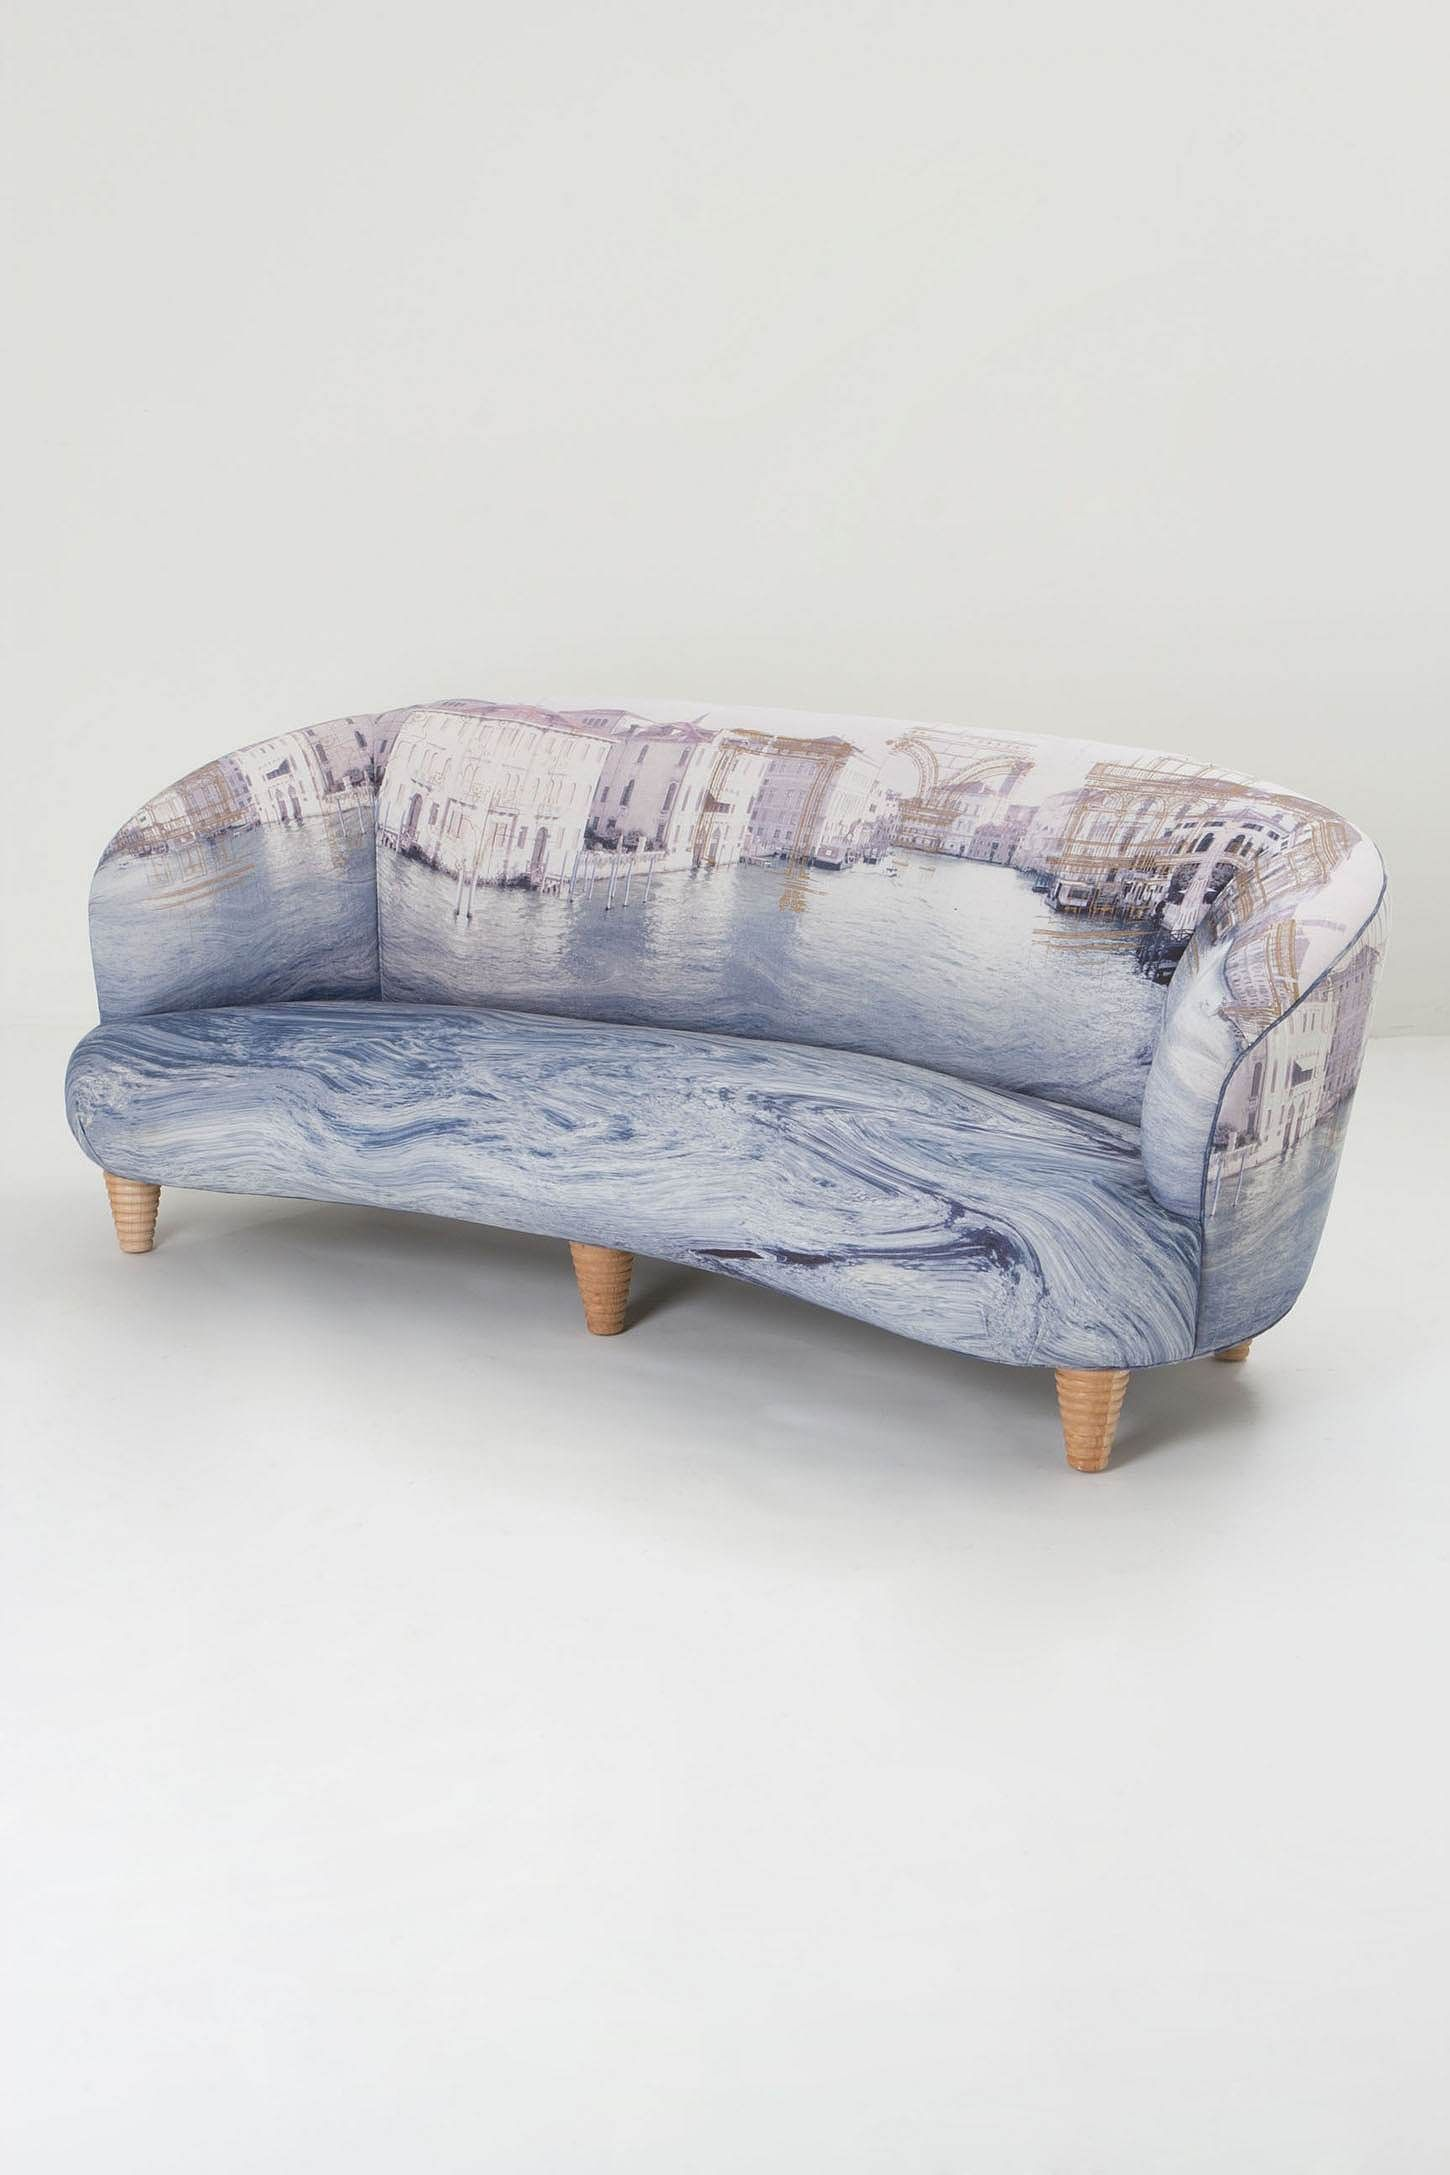 Arlo sofa warm living roomssofa designfurniture